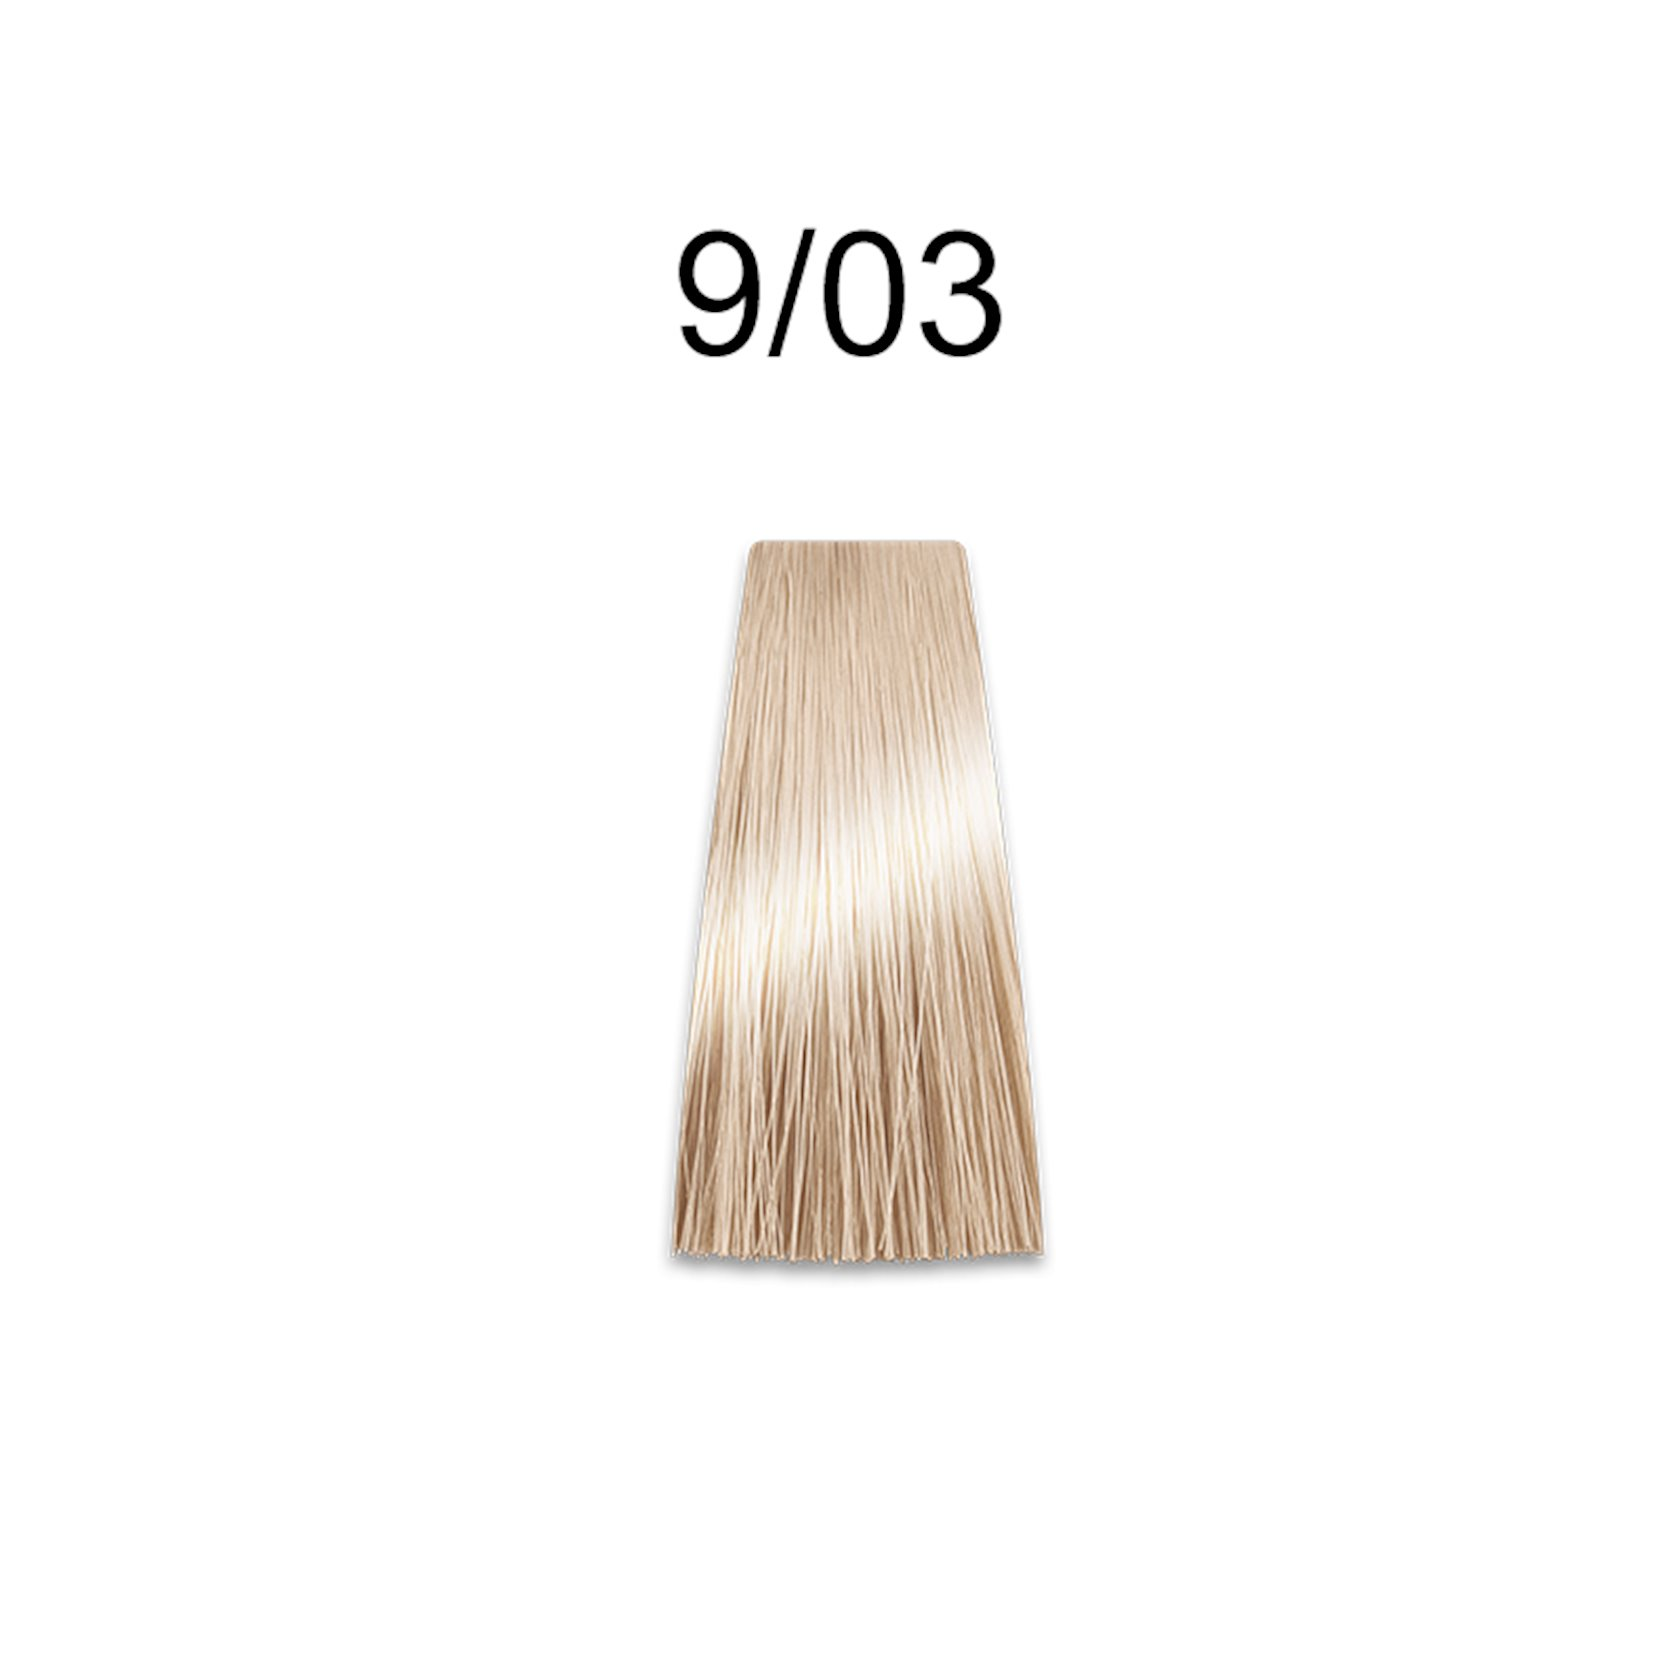 Saçlar üçün krem-boya Prosalon Professional Intensis Color Art № 9-03 beige light blond 100 ml